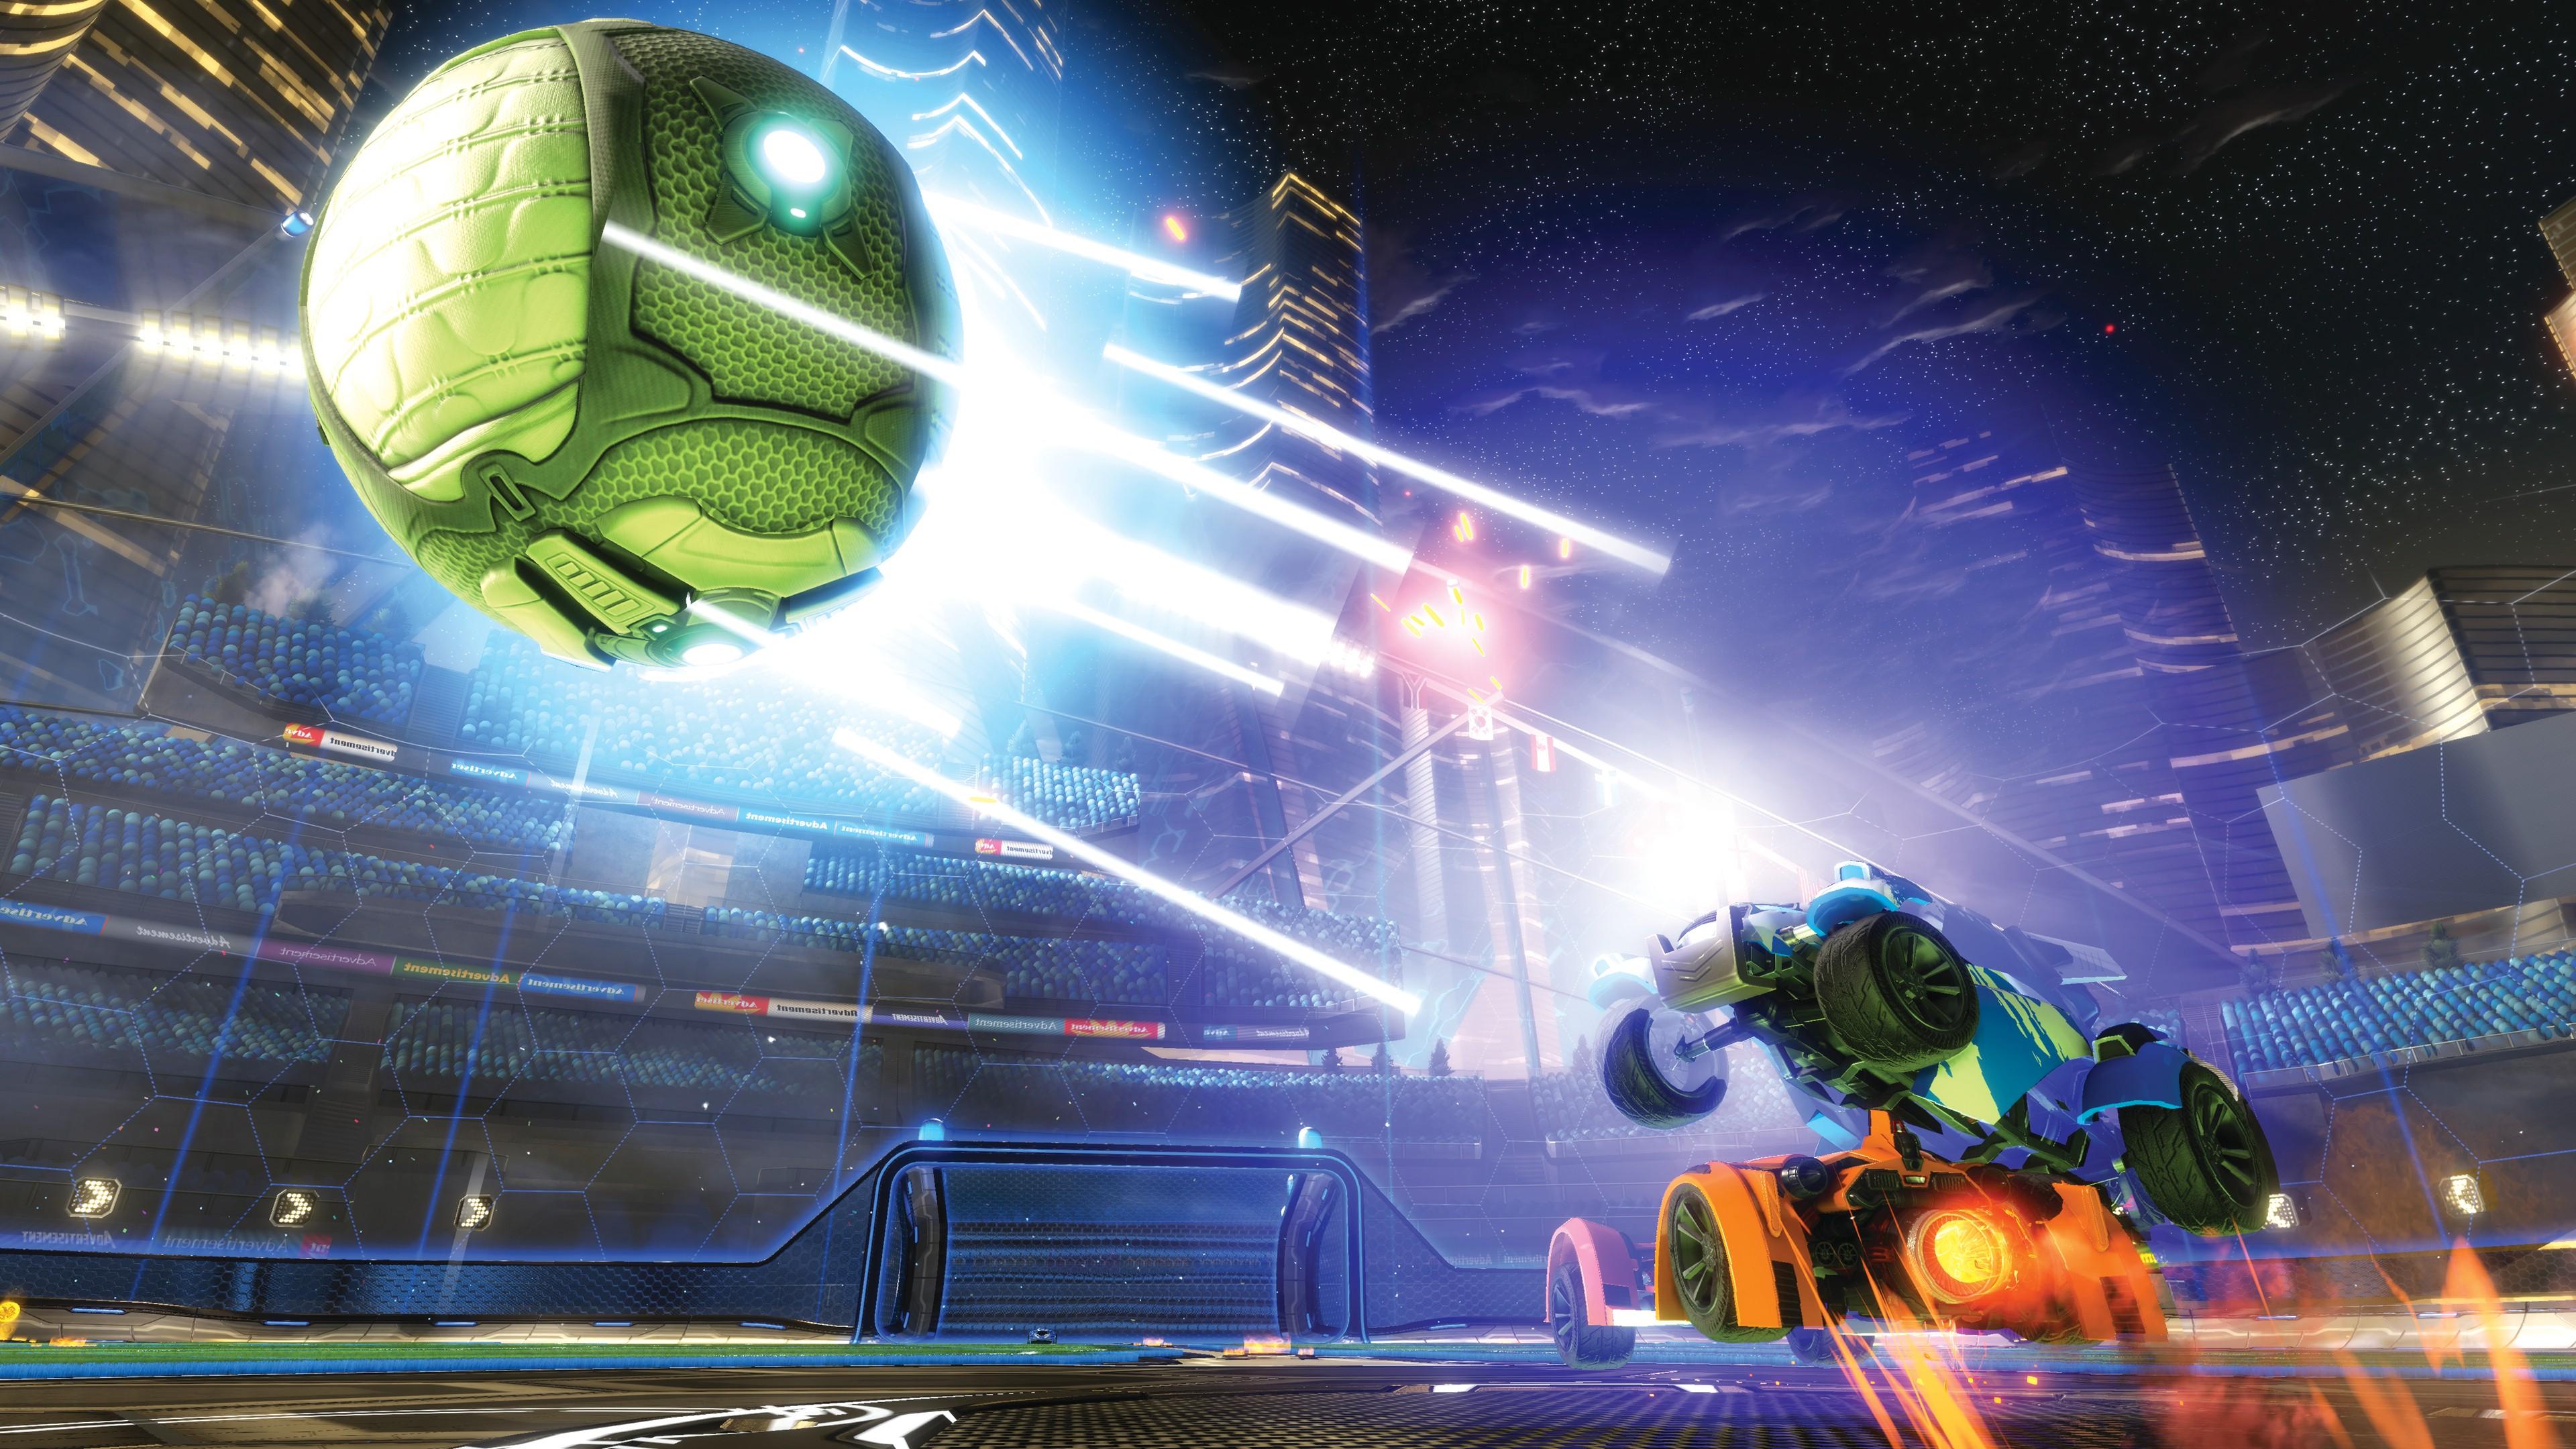 Wallpaper Rocket League GDC Awards 2016 PC PS 4 Xbox One Games 9776